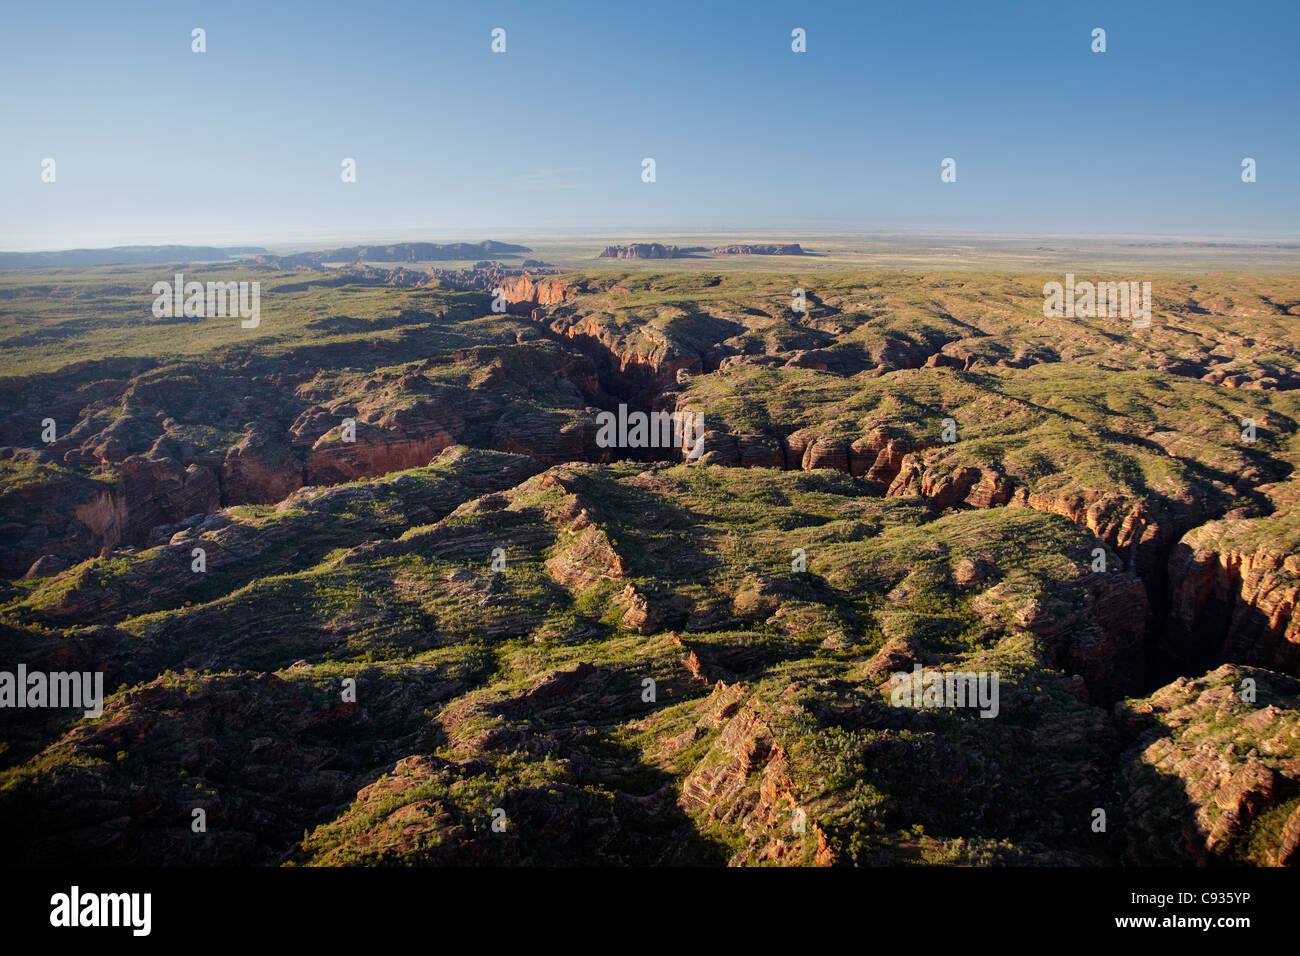 Piccaninny Gorge, Bungle Bungles, Purnululu National Park, Kimberley Region, Western Australia, Australia - aerial Stock Photo